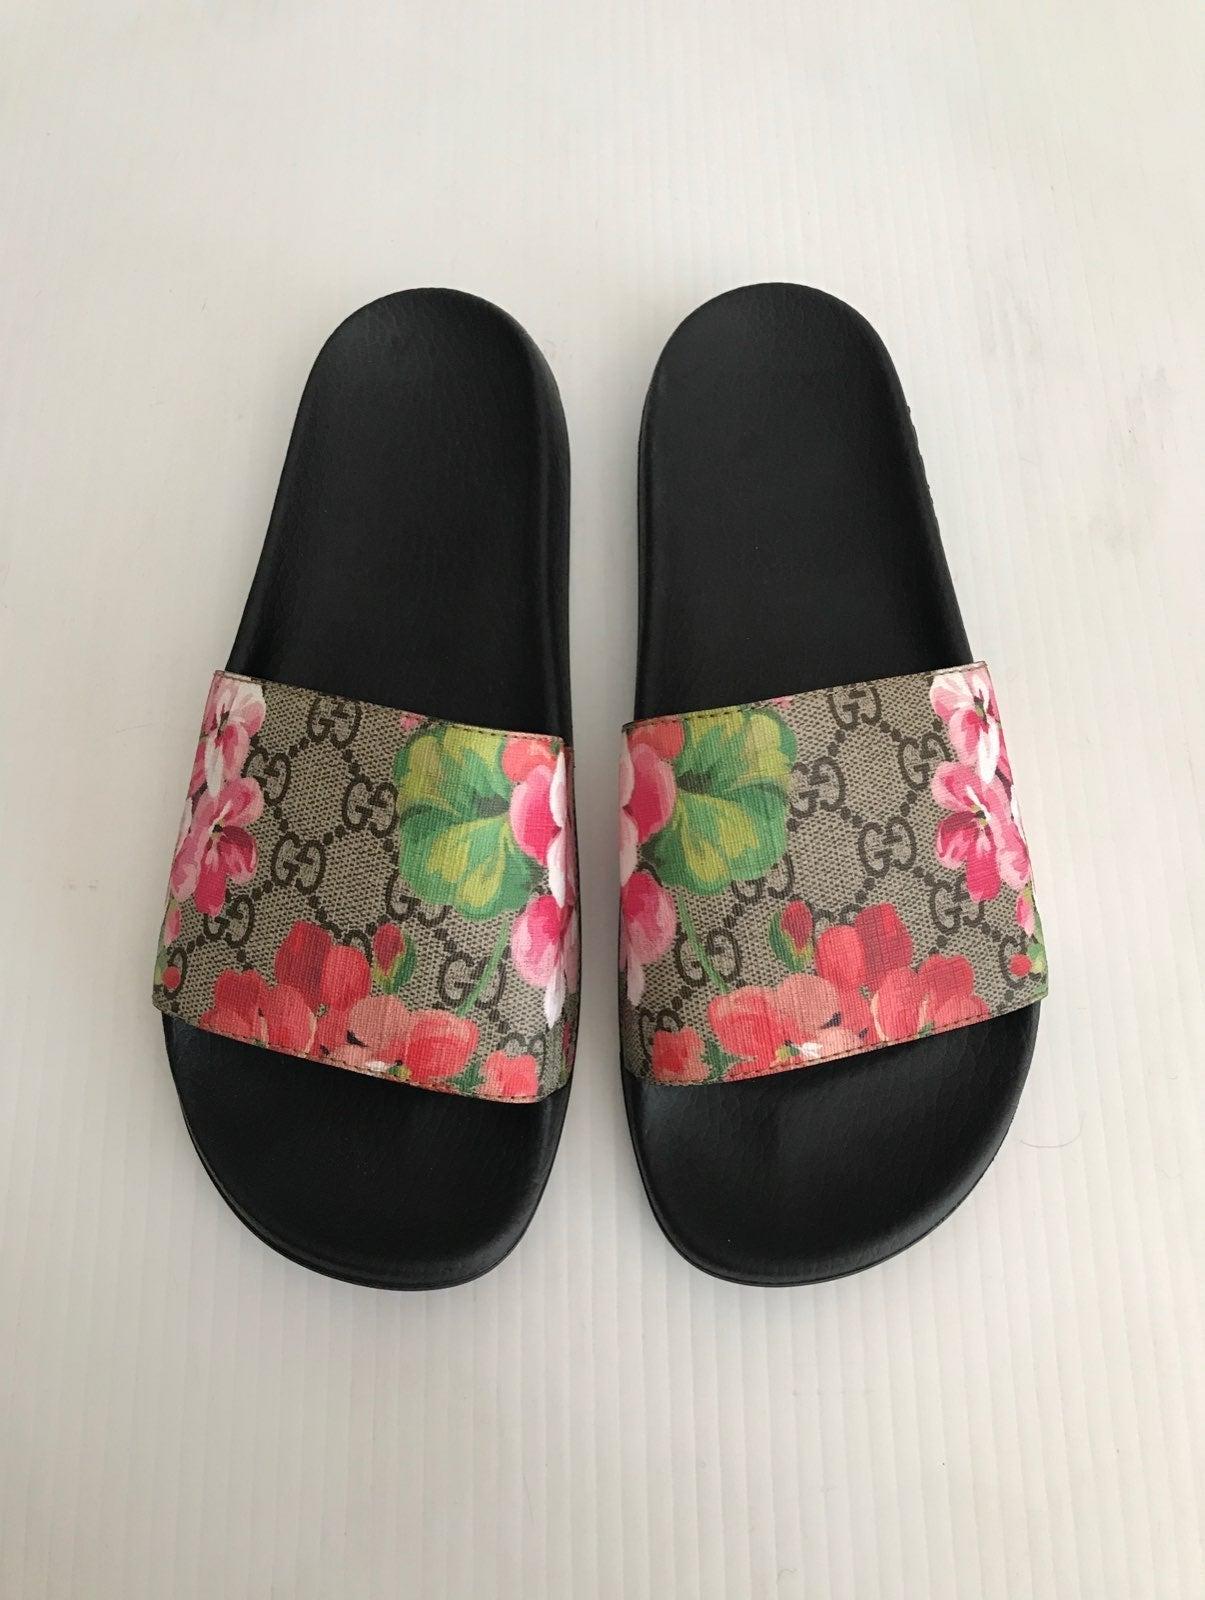 Gucci GG Bloom Pursuit Slide Sandal 40